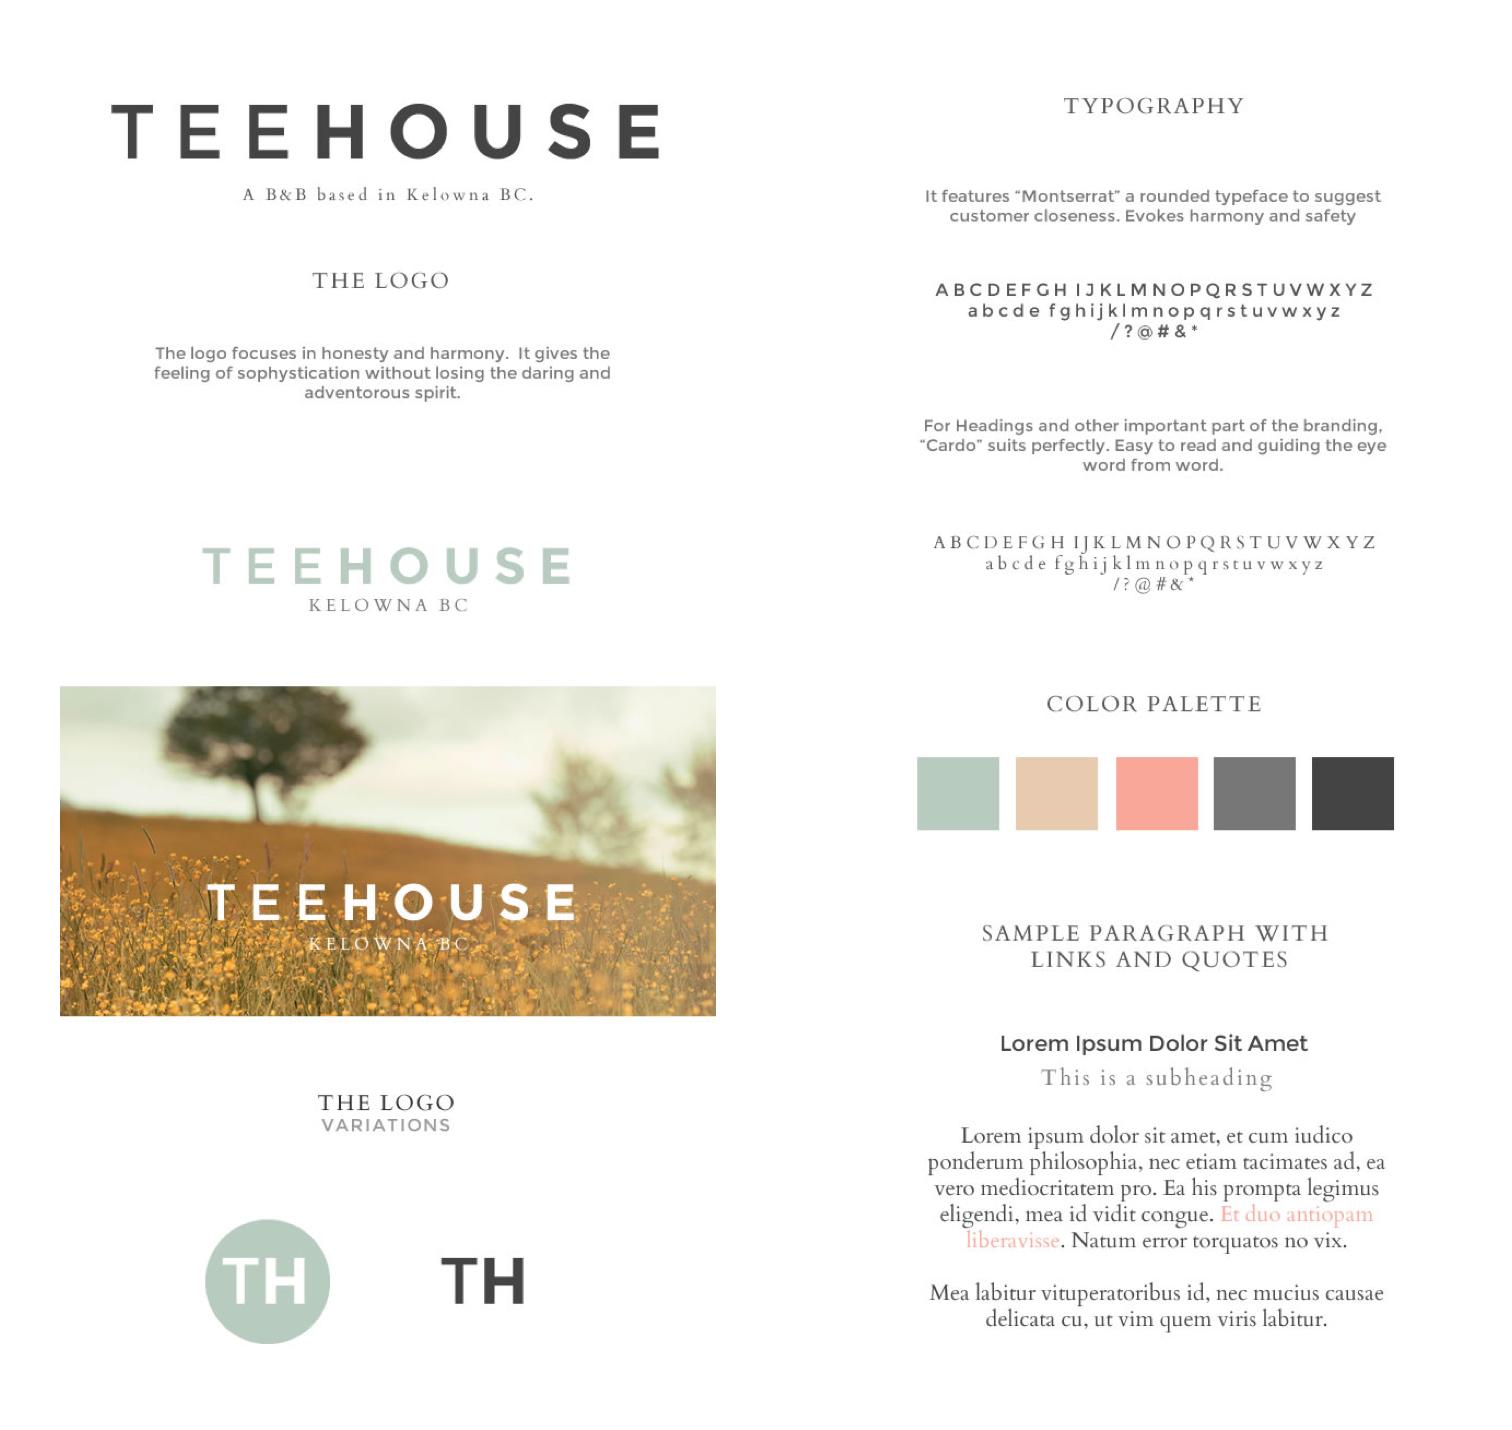 Teehouse